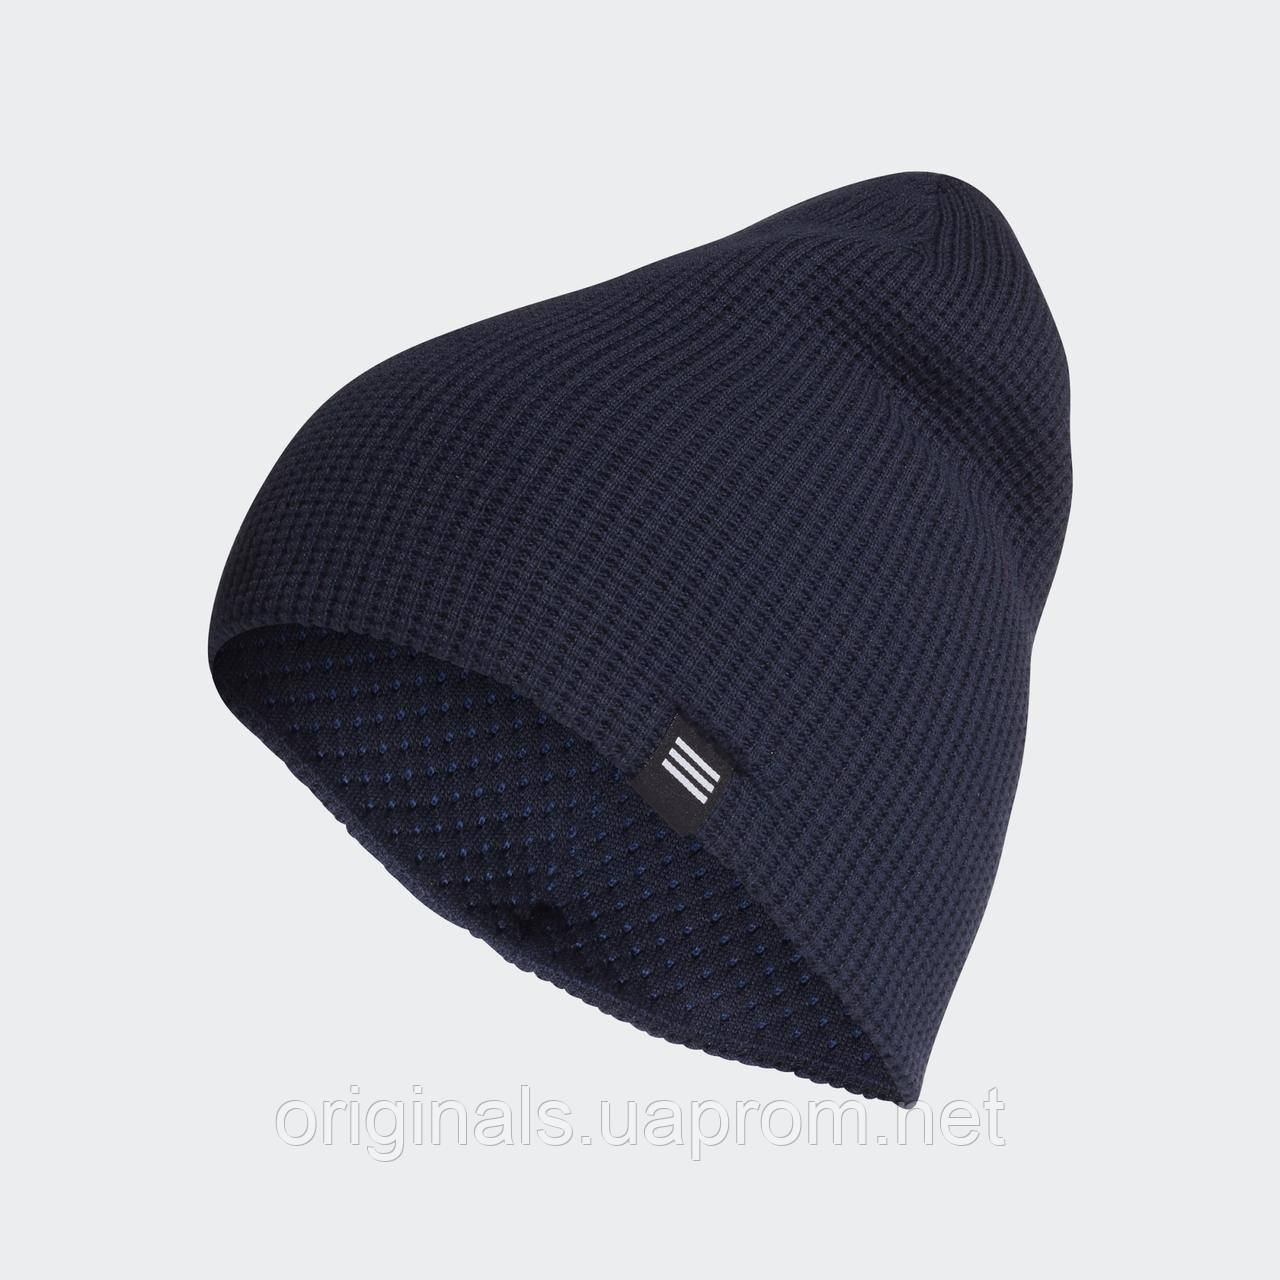 Двухсторонняя шапка Adidas Beanie Performance DZ6194